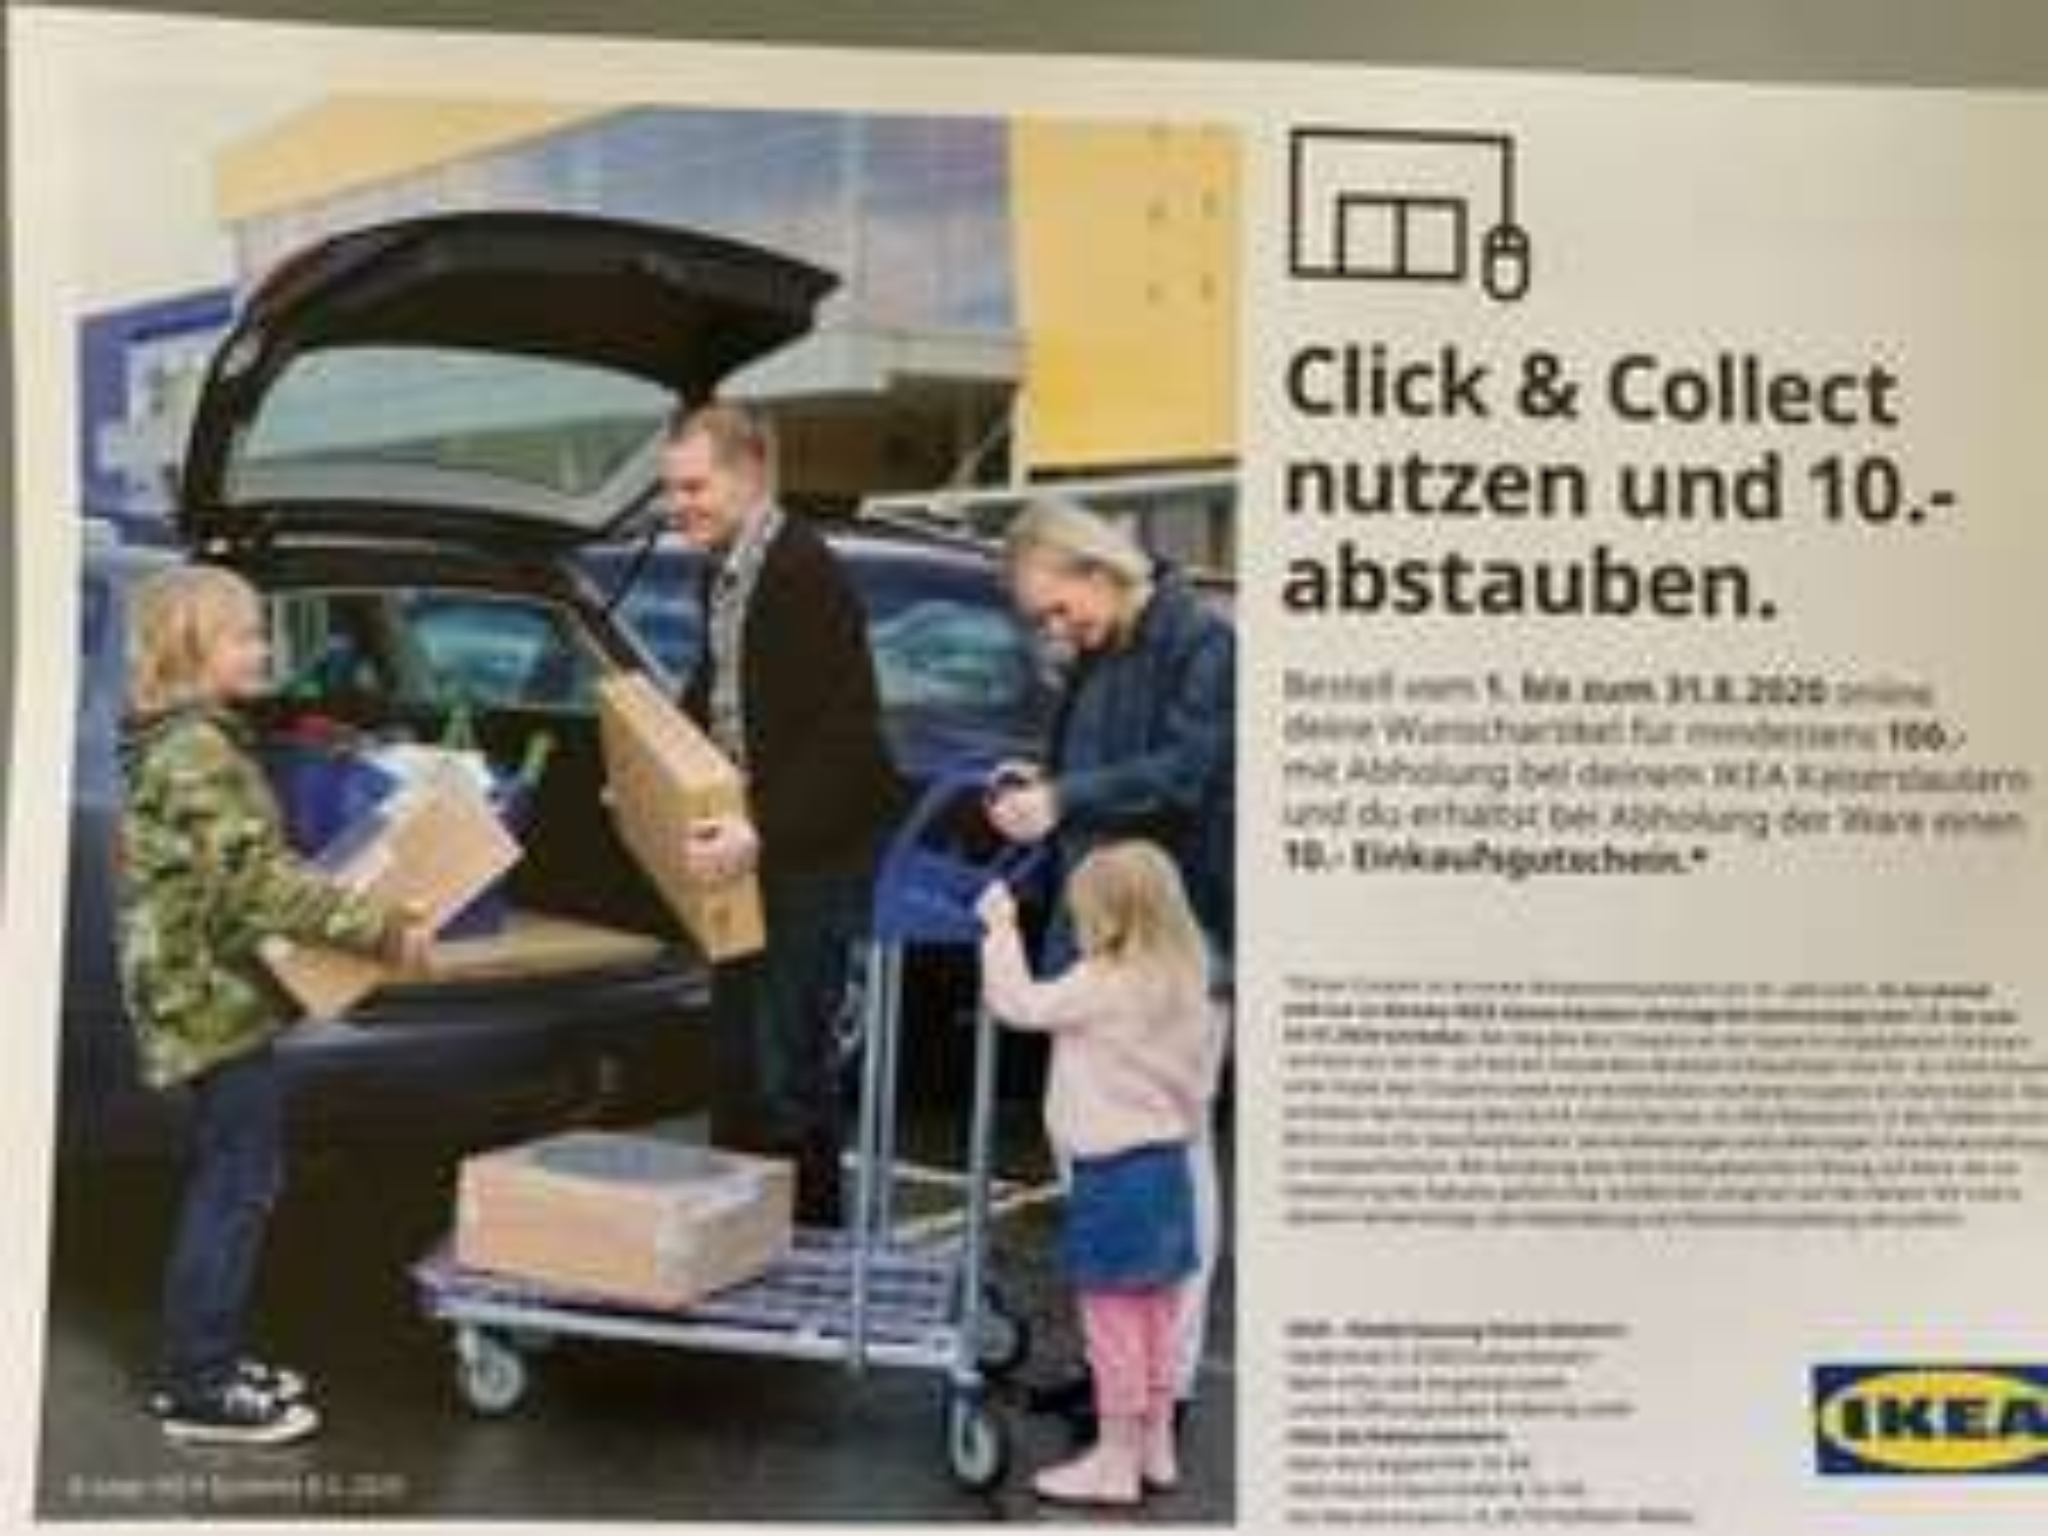 Lokal IKEA Kaiserslautern Click & Collect 10€ Gutschein ab 100€ Einkauf